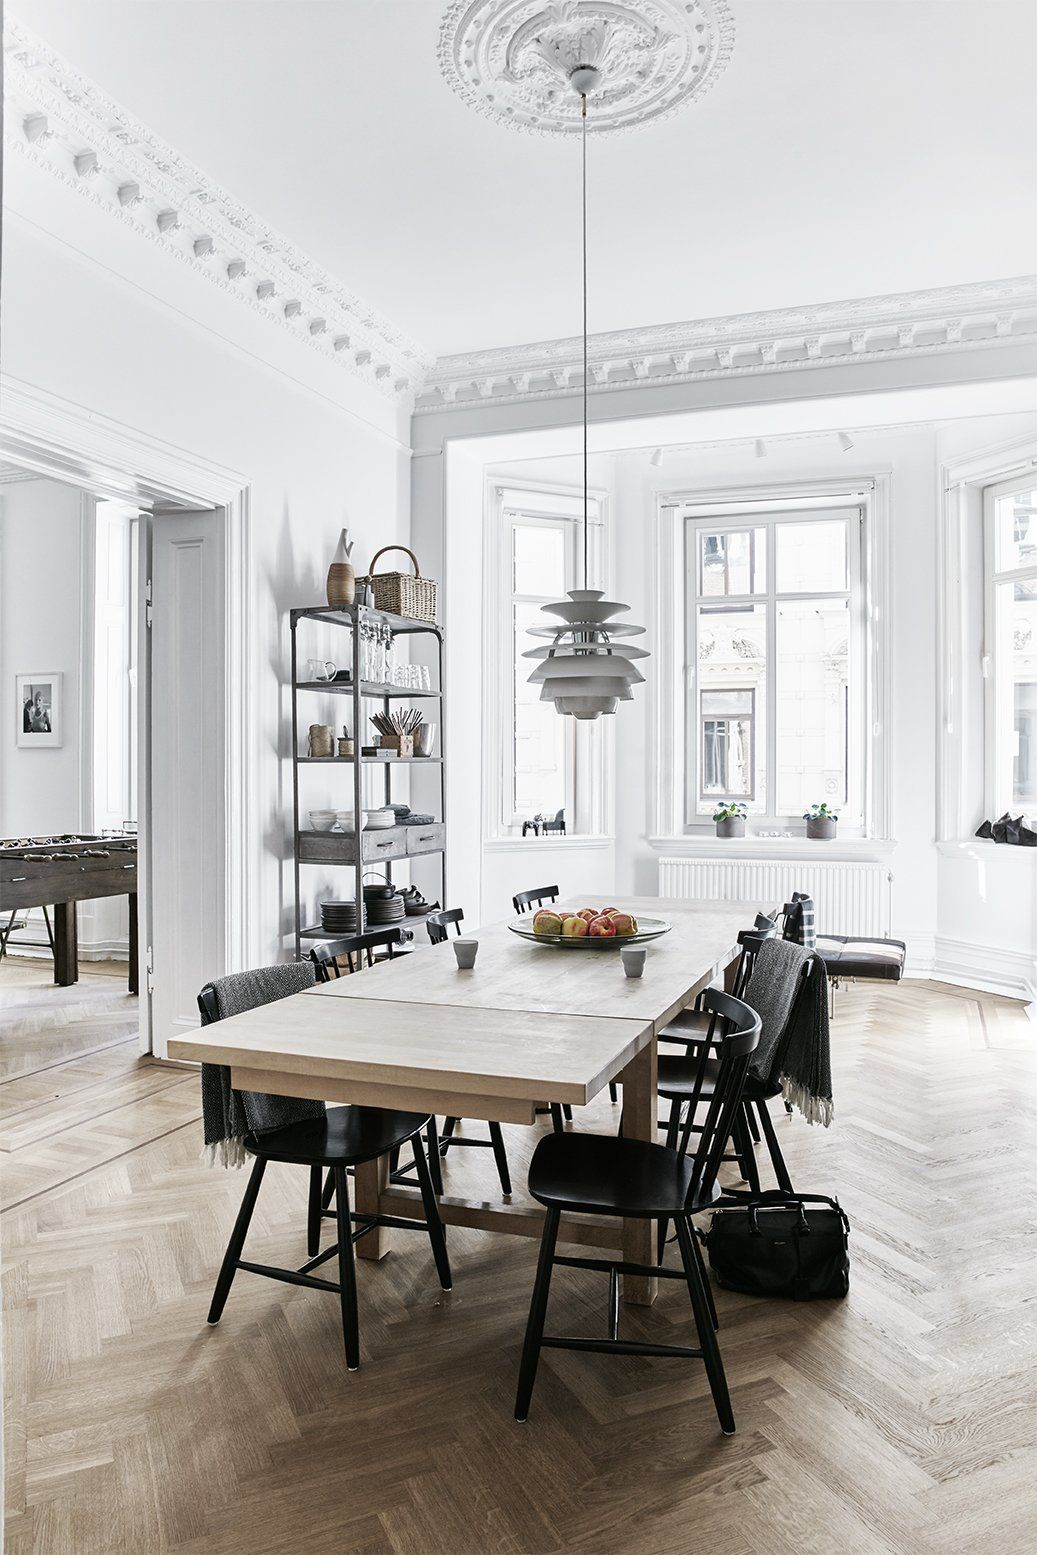 A careful renovation of a 19th century flat in gothenburg brings it back to life · modern interiorsscandinavian